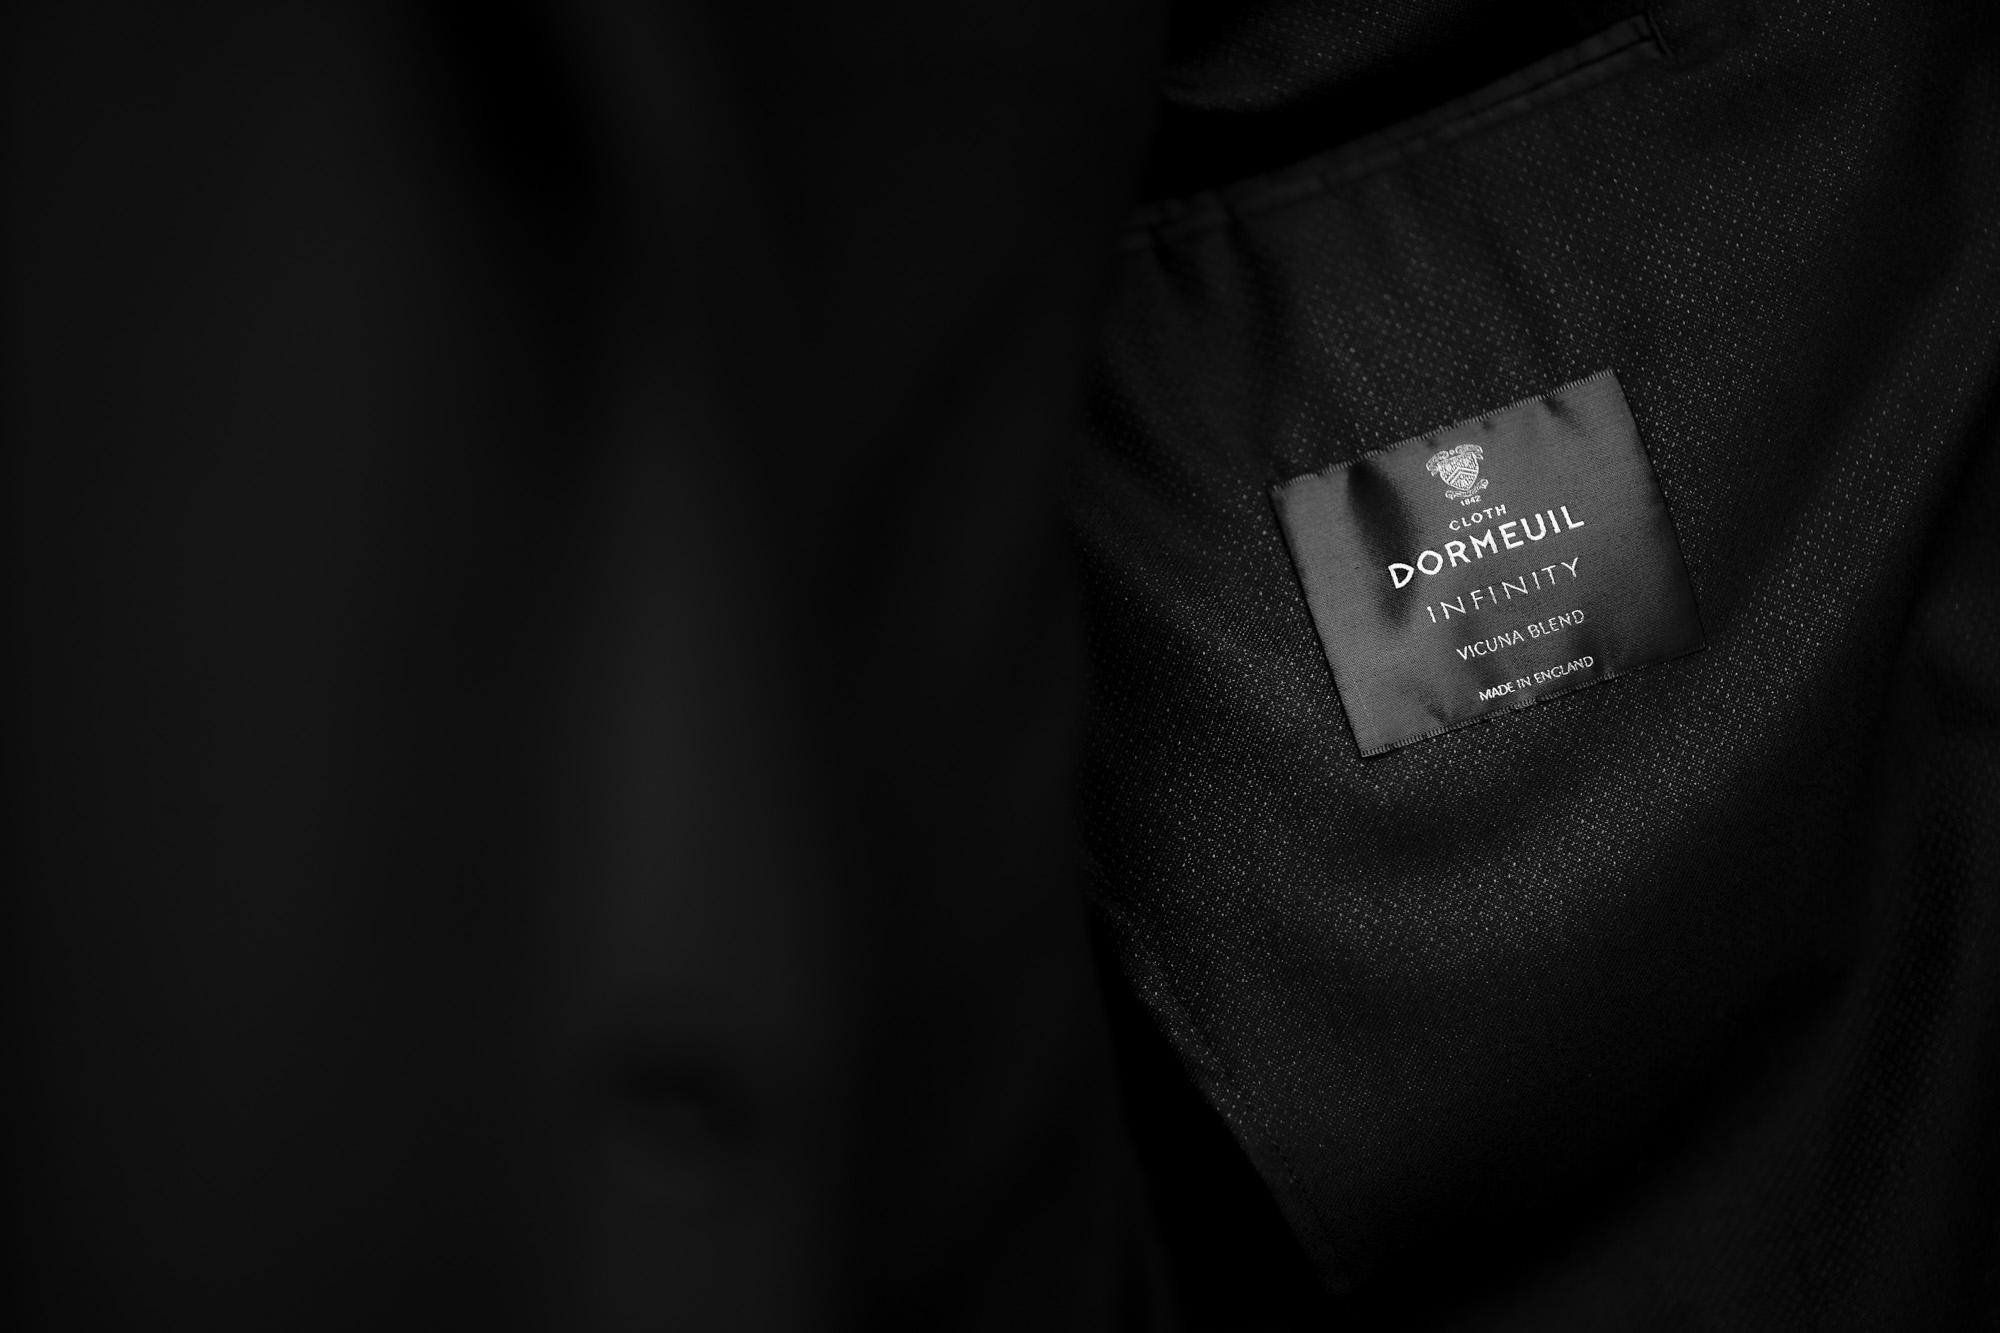 "cuervo bopoha Gaudí DORMEUIL ""VICUNA"" BLACK × BROWN 2021 AW 【Special Model】 愛知 名古屋 Alto e Diritto altoediritto アルトエデリット  クエルボヴァローナ ガウディ ドーメル ビキューナ ジャケット Worsted Wool Super 180's Silk Vicuna シルク"